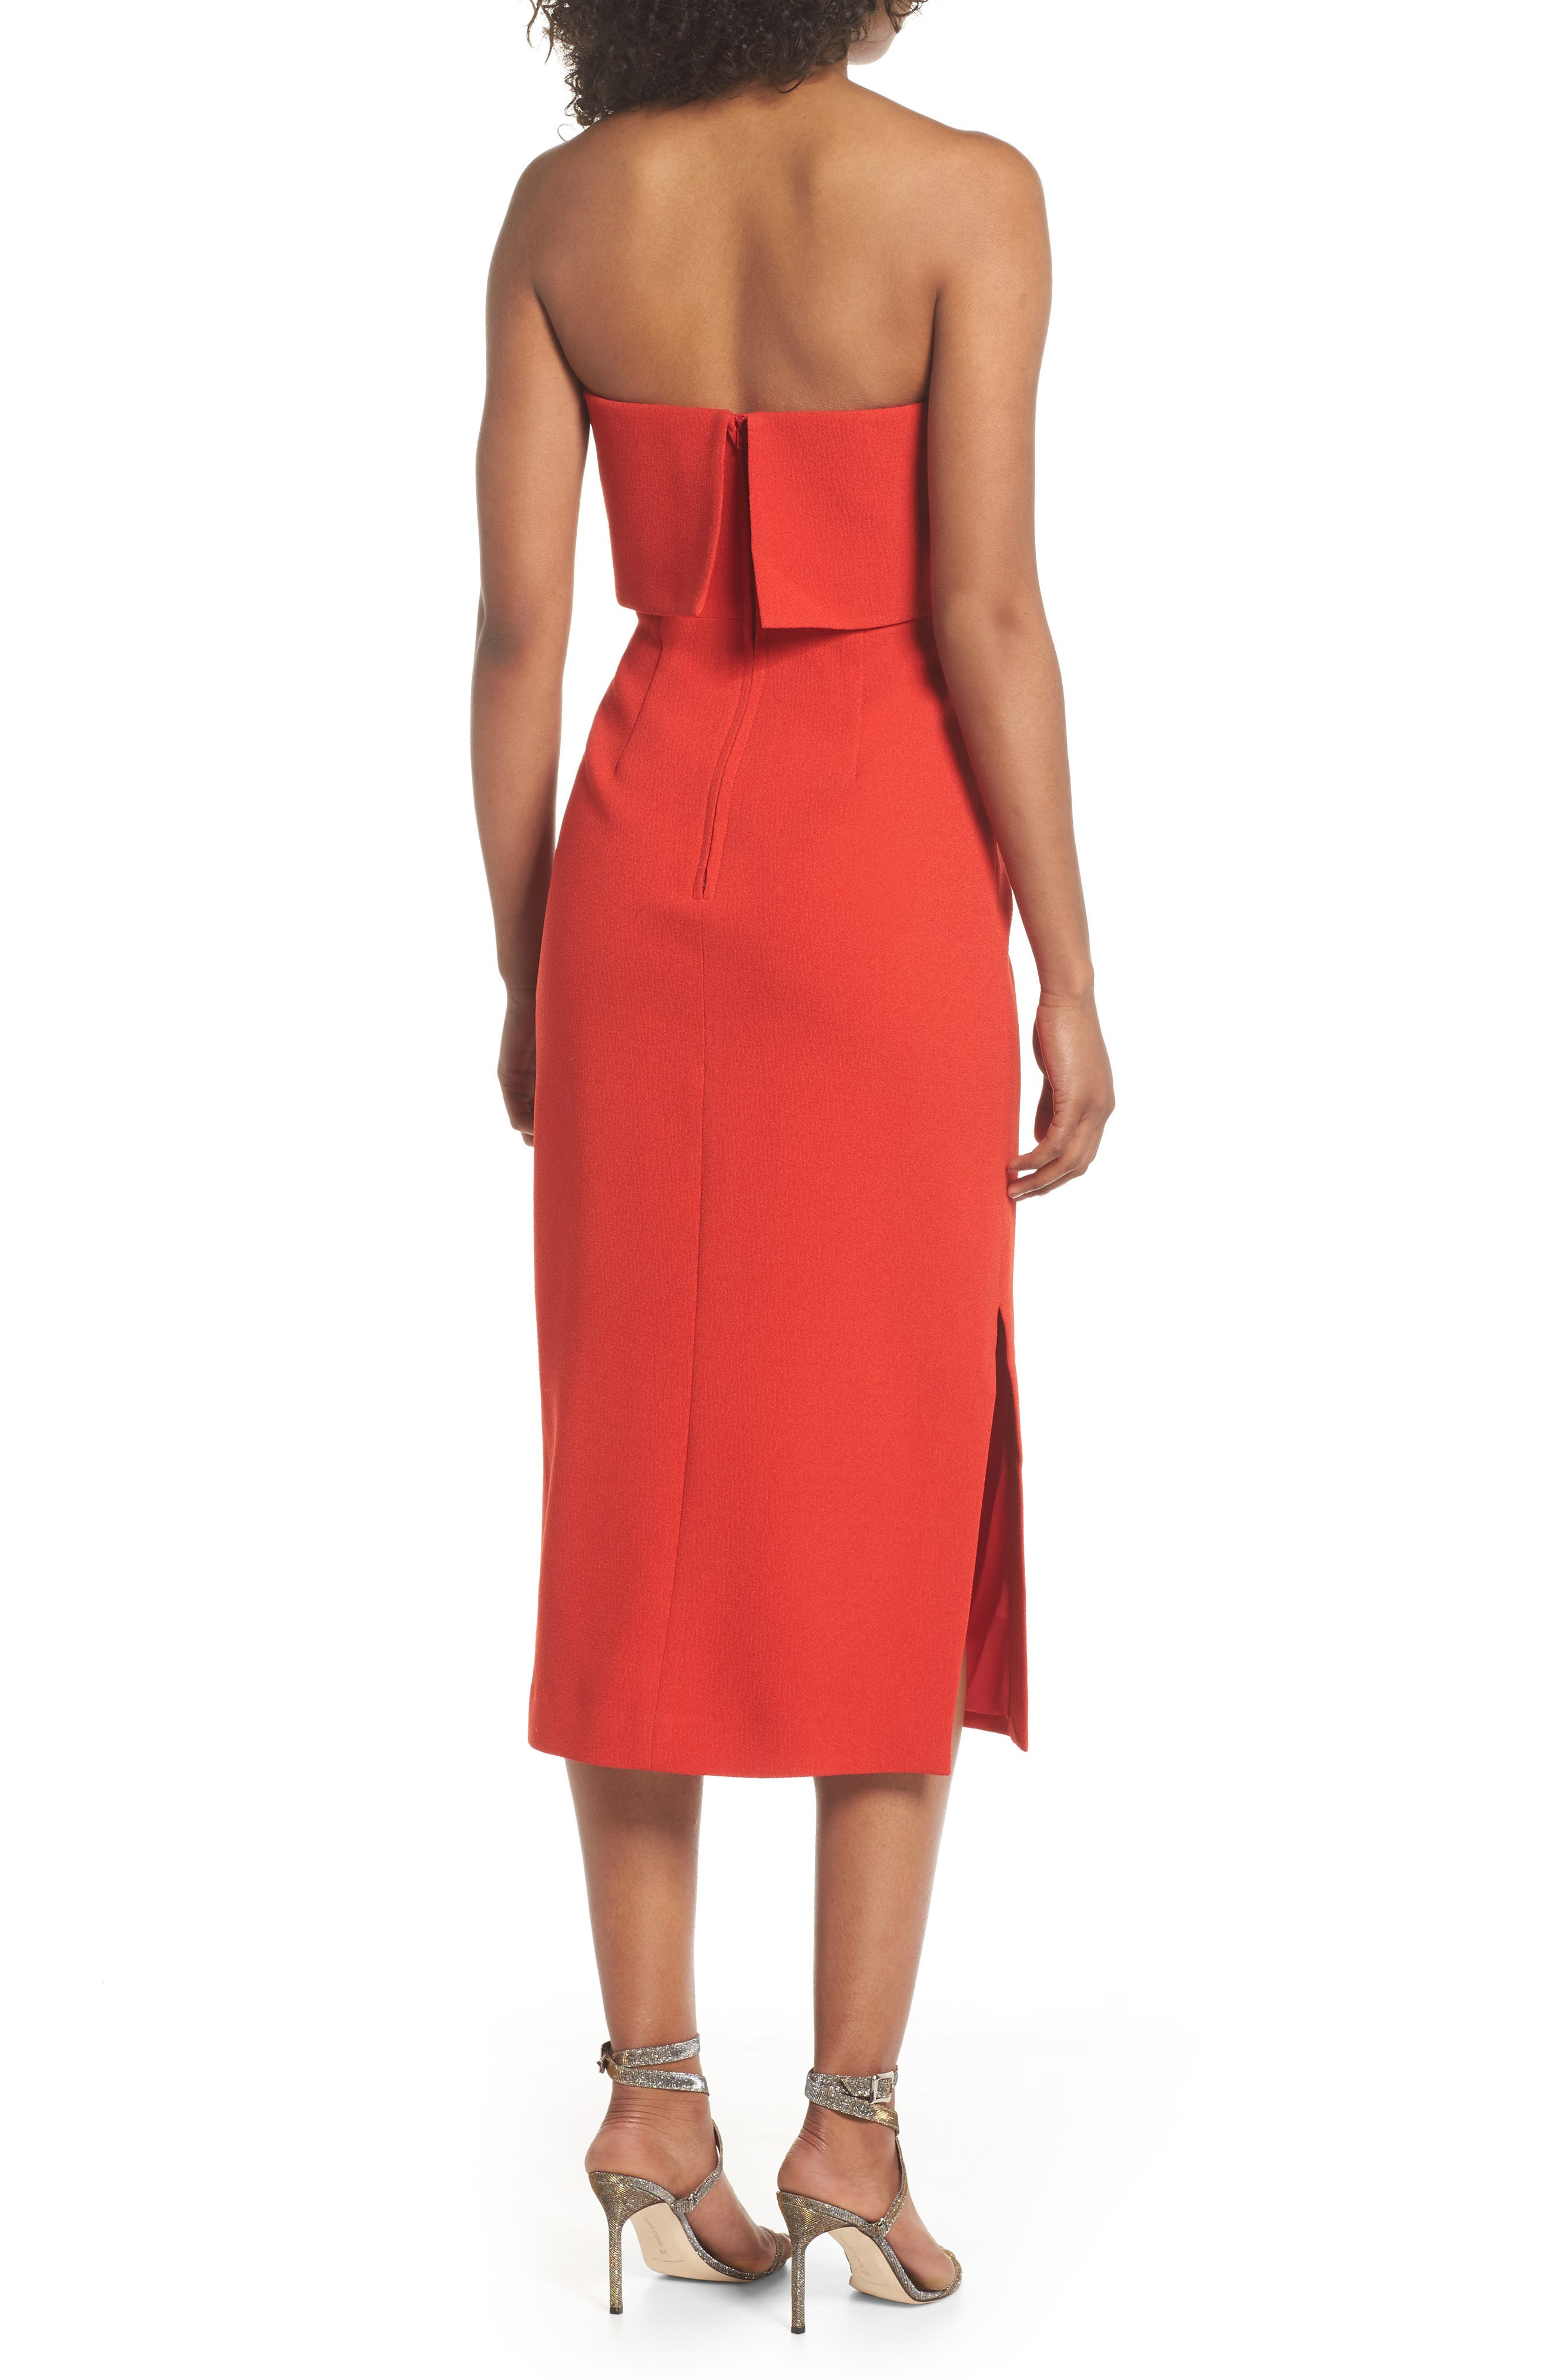 Entice Strapless Midi Dress,                             Alternate thumbnail 2, color,